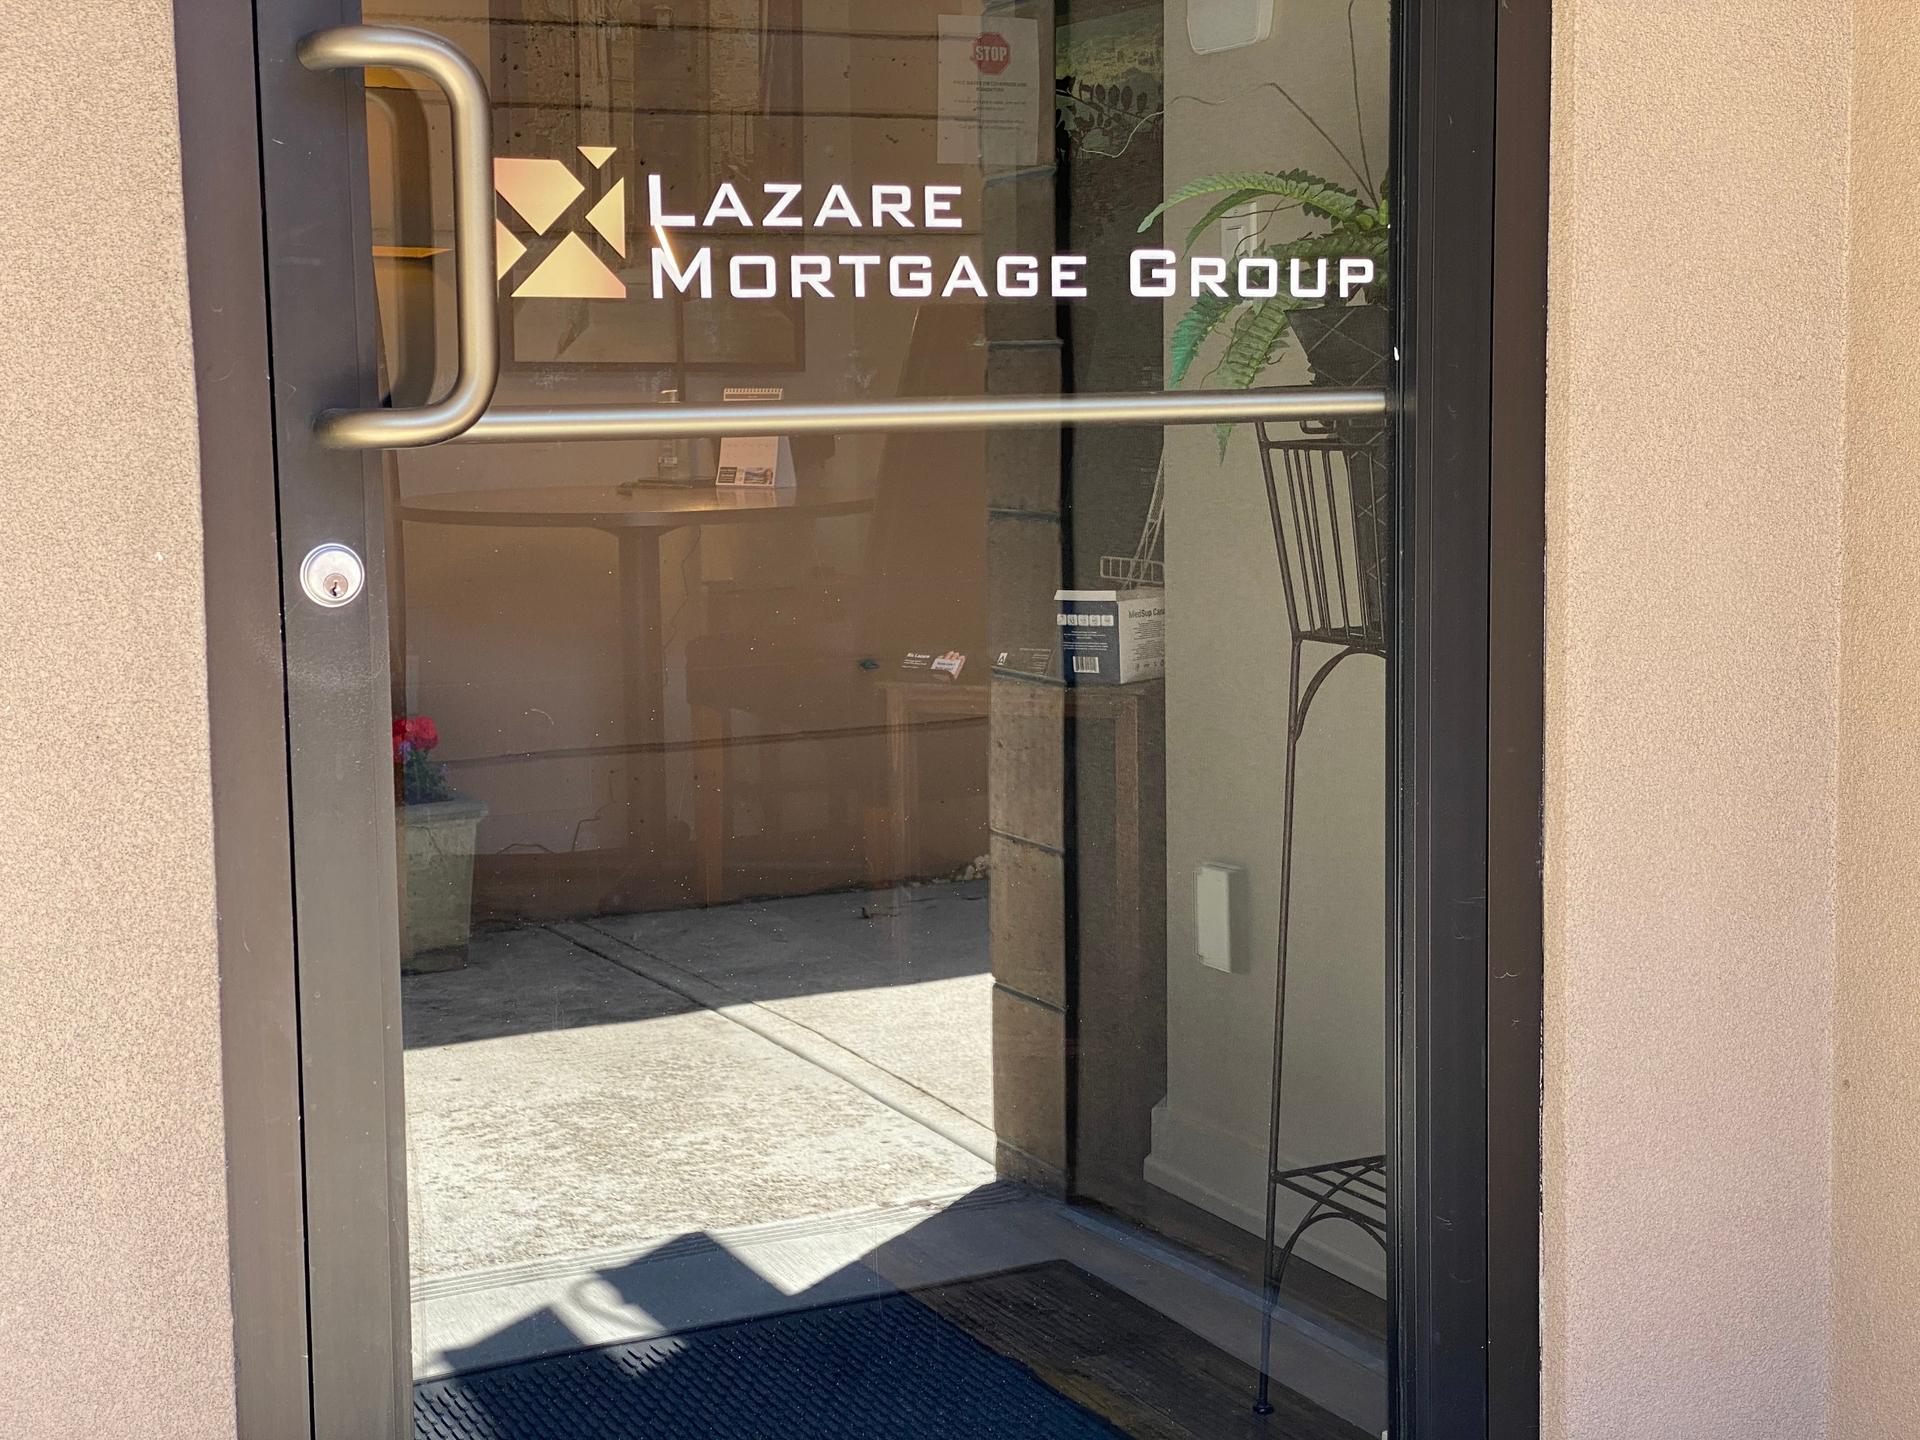 Ric Lazare - Mortgage Broker Kelowna (@riclazaremortgagebrokerkelowna) Cover Image